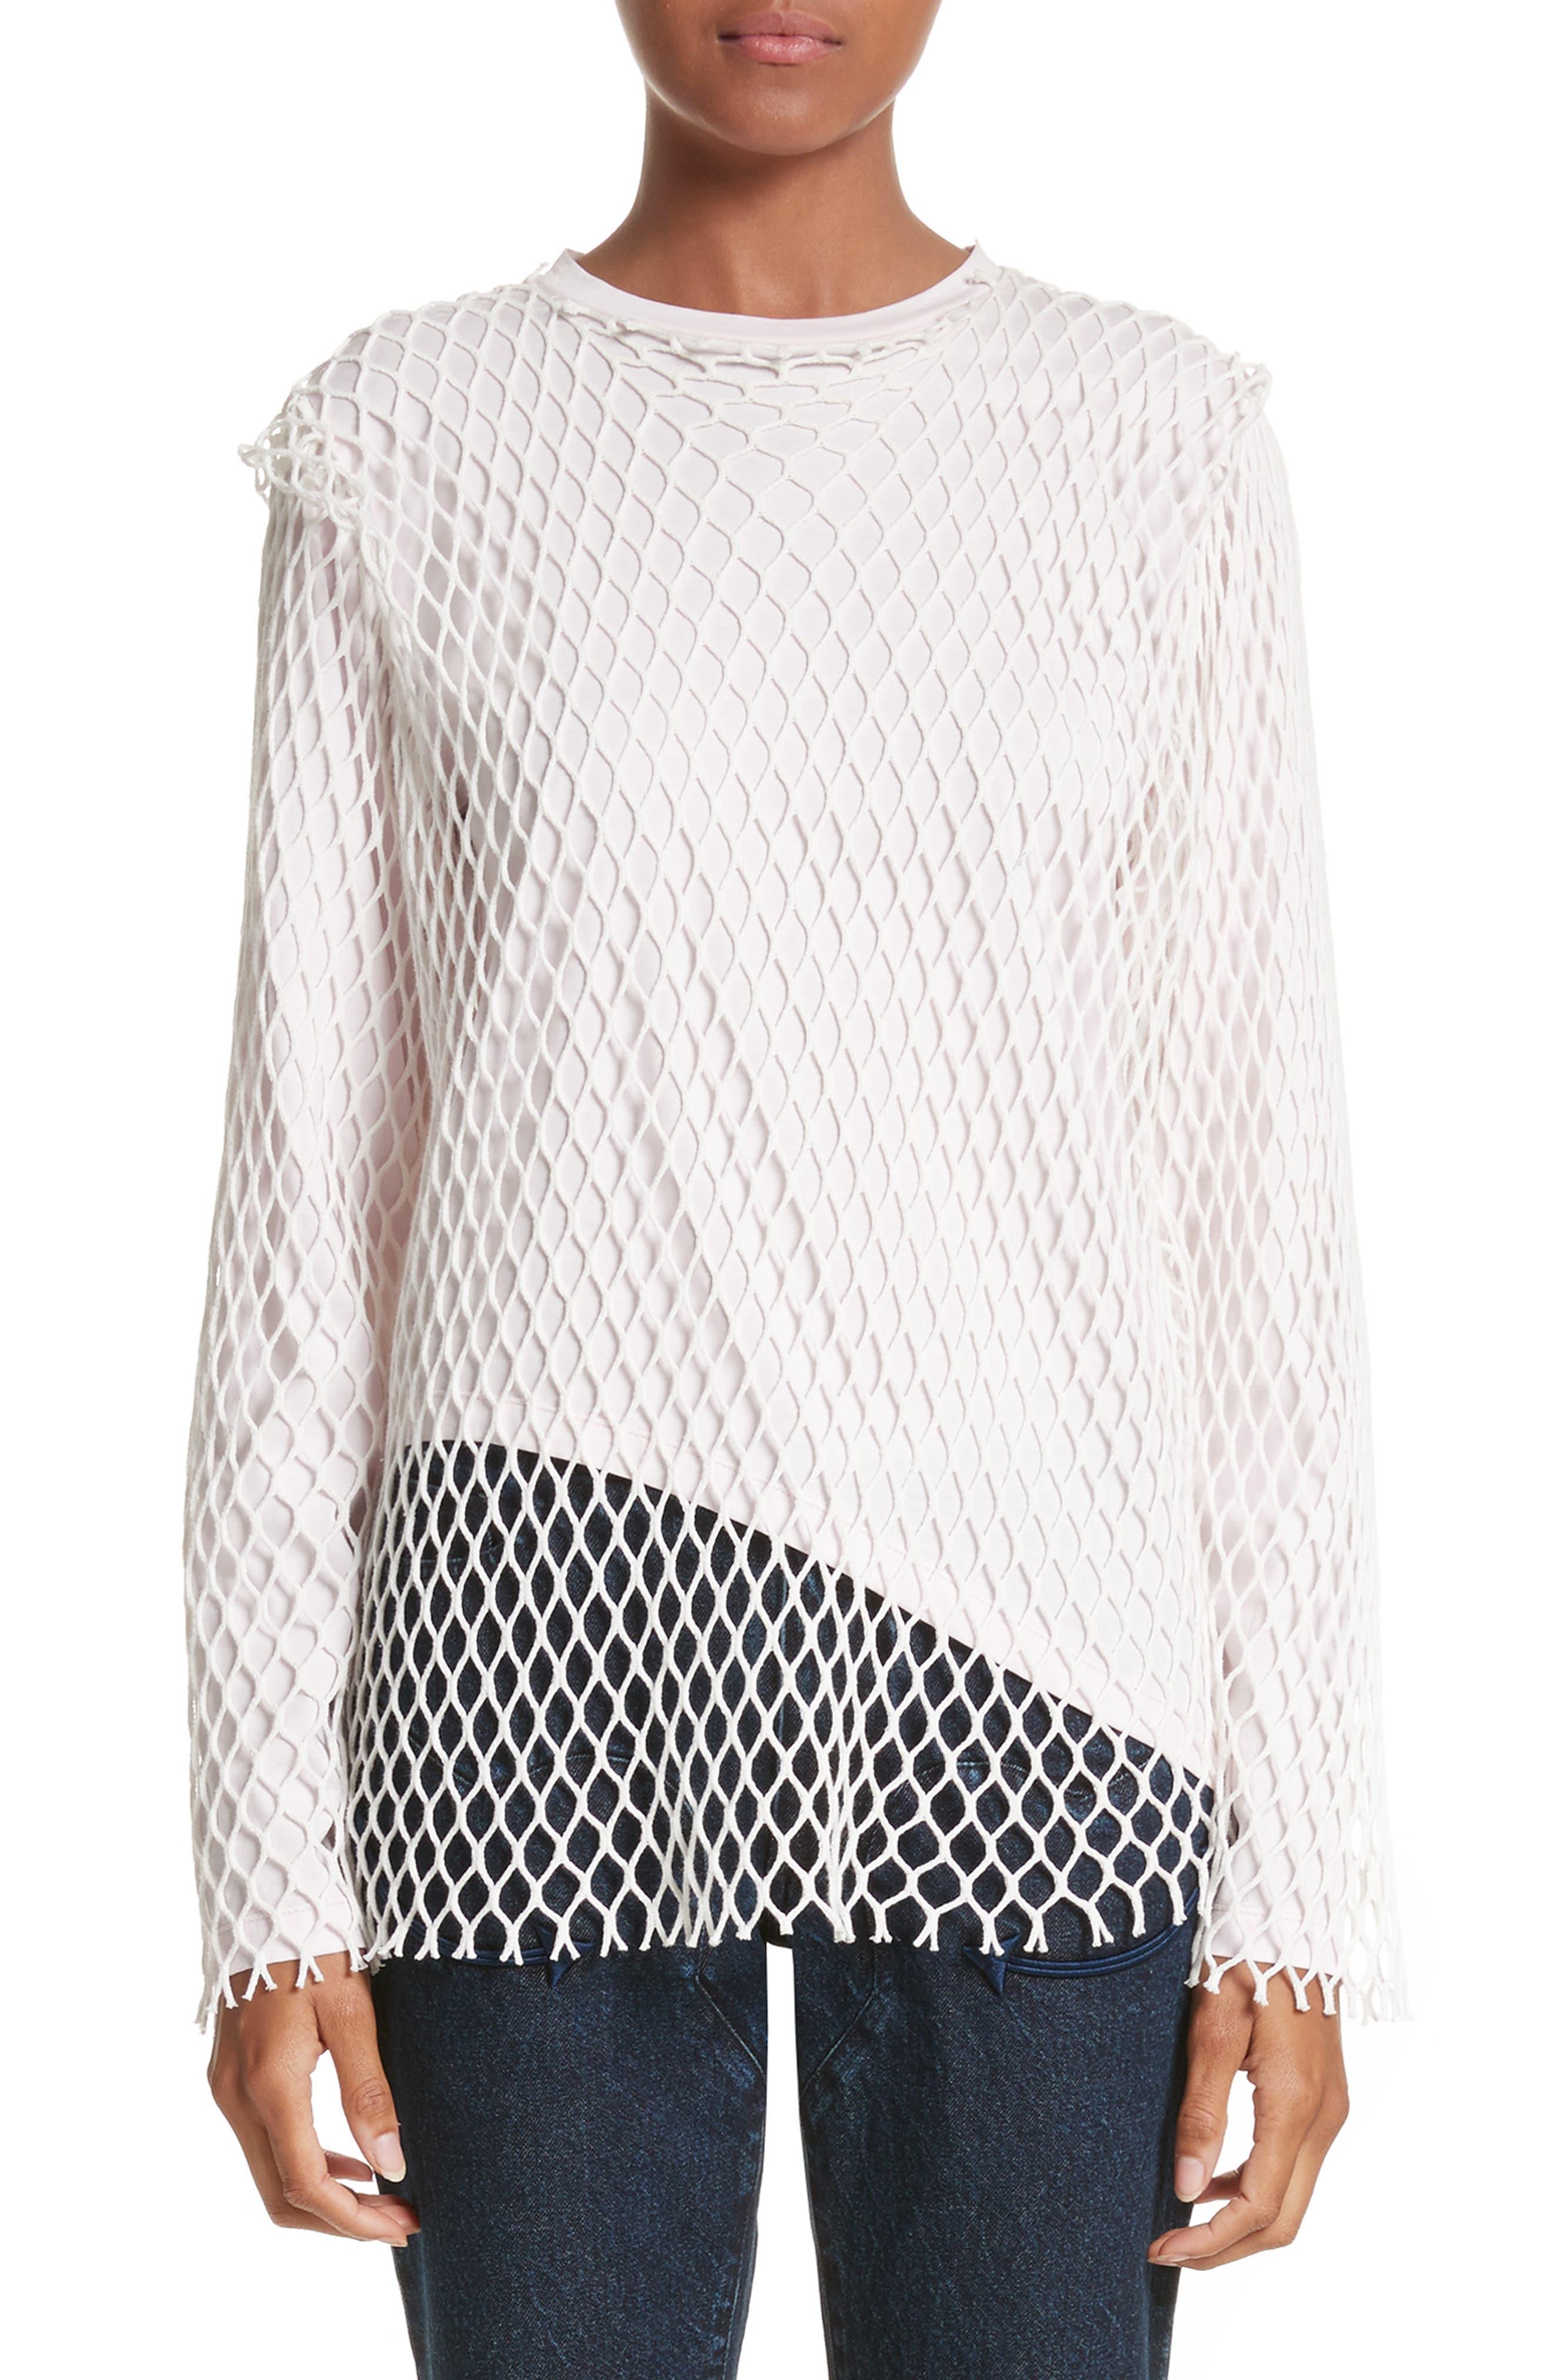 Main Image - Marques'Almeida Net Jersey Top